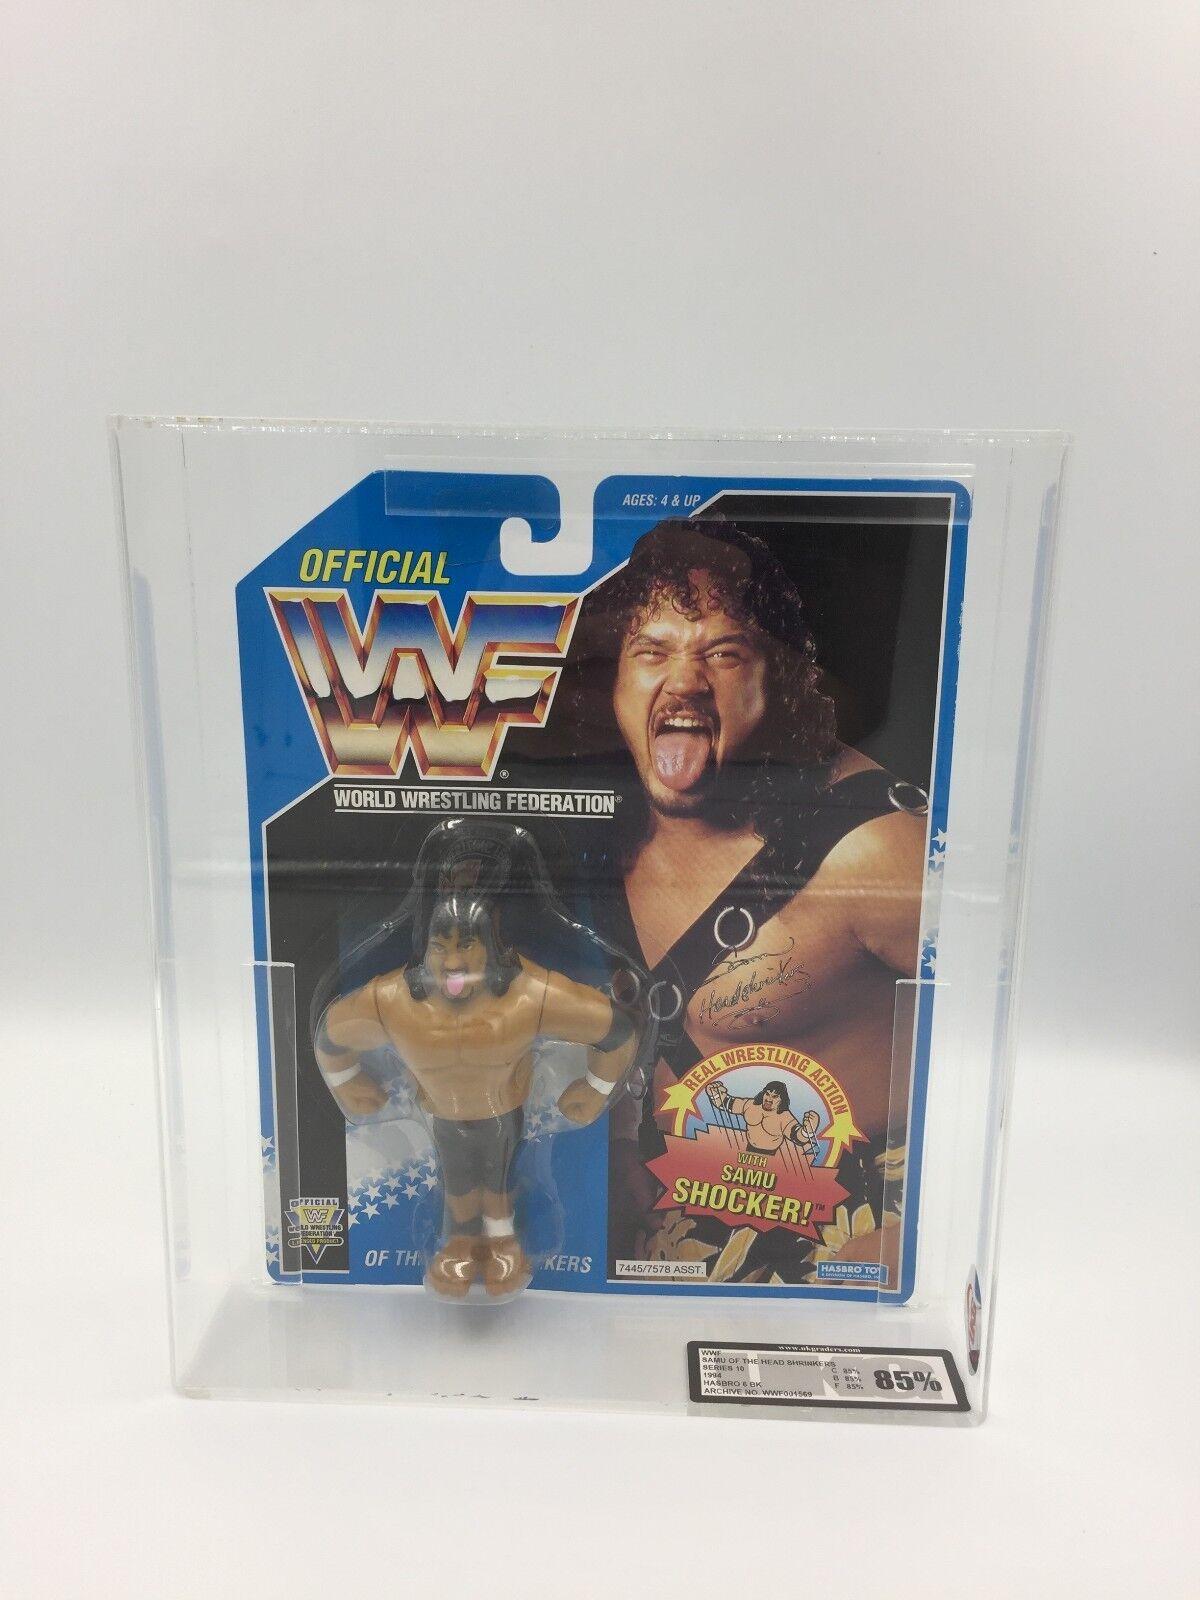 minorista de fitness WWF Hasbro Hasbro Hasbro SAMU del Headshrinkers serie 10 1994 CochedadaG 85% no Afa  suministramos lo mejor